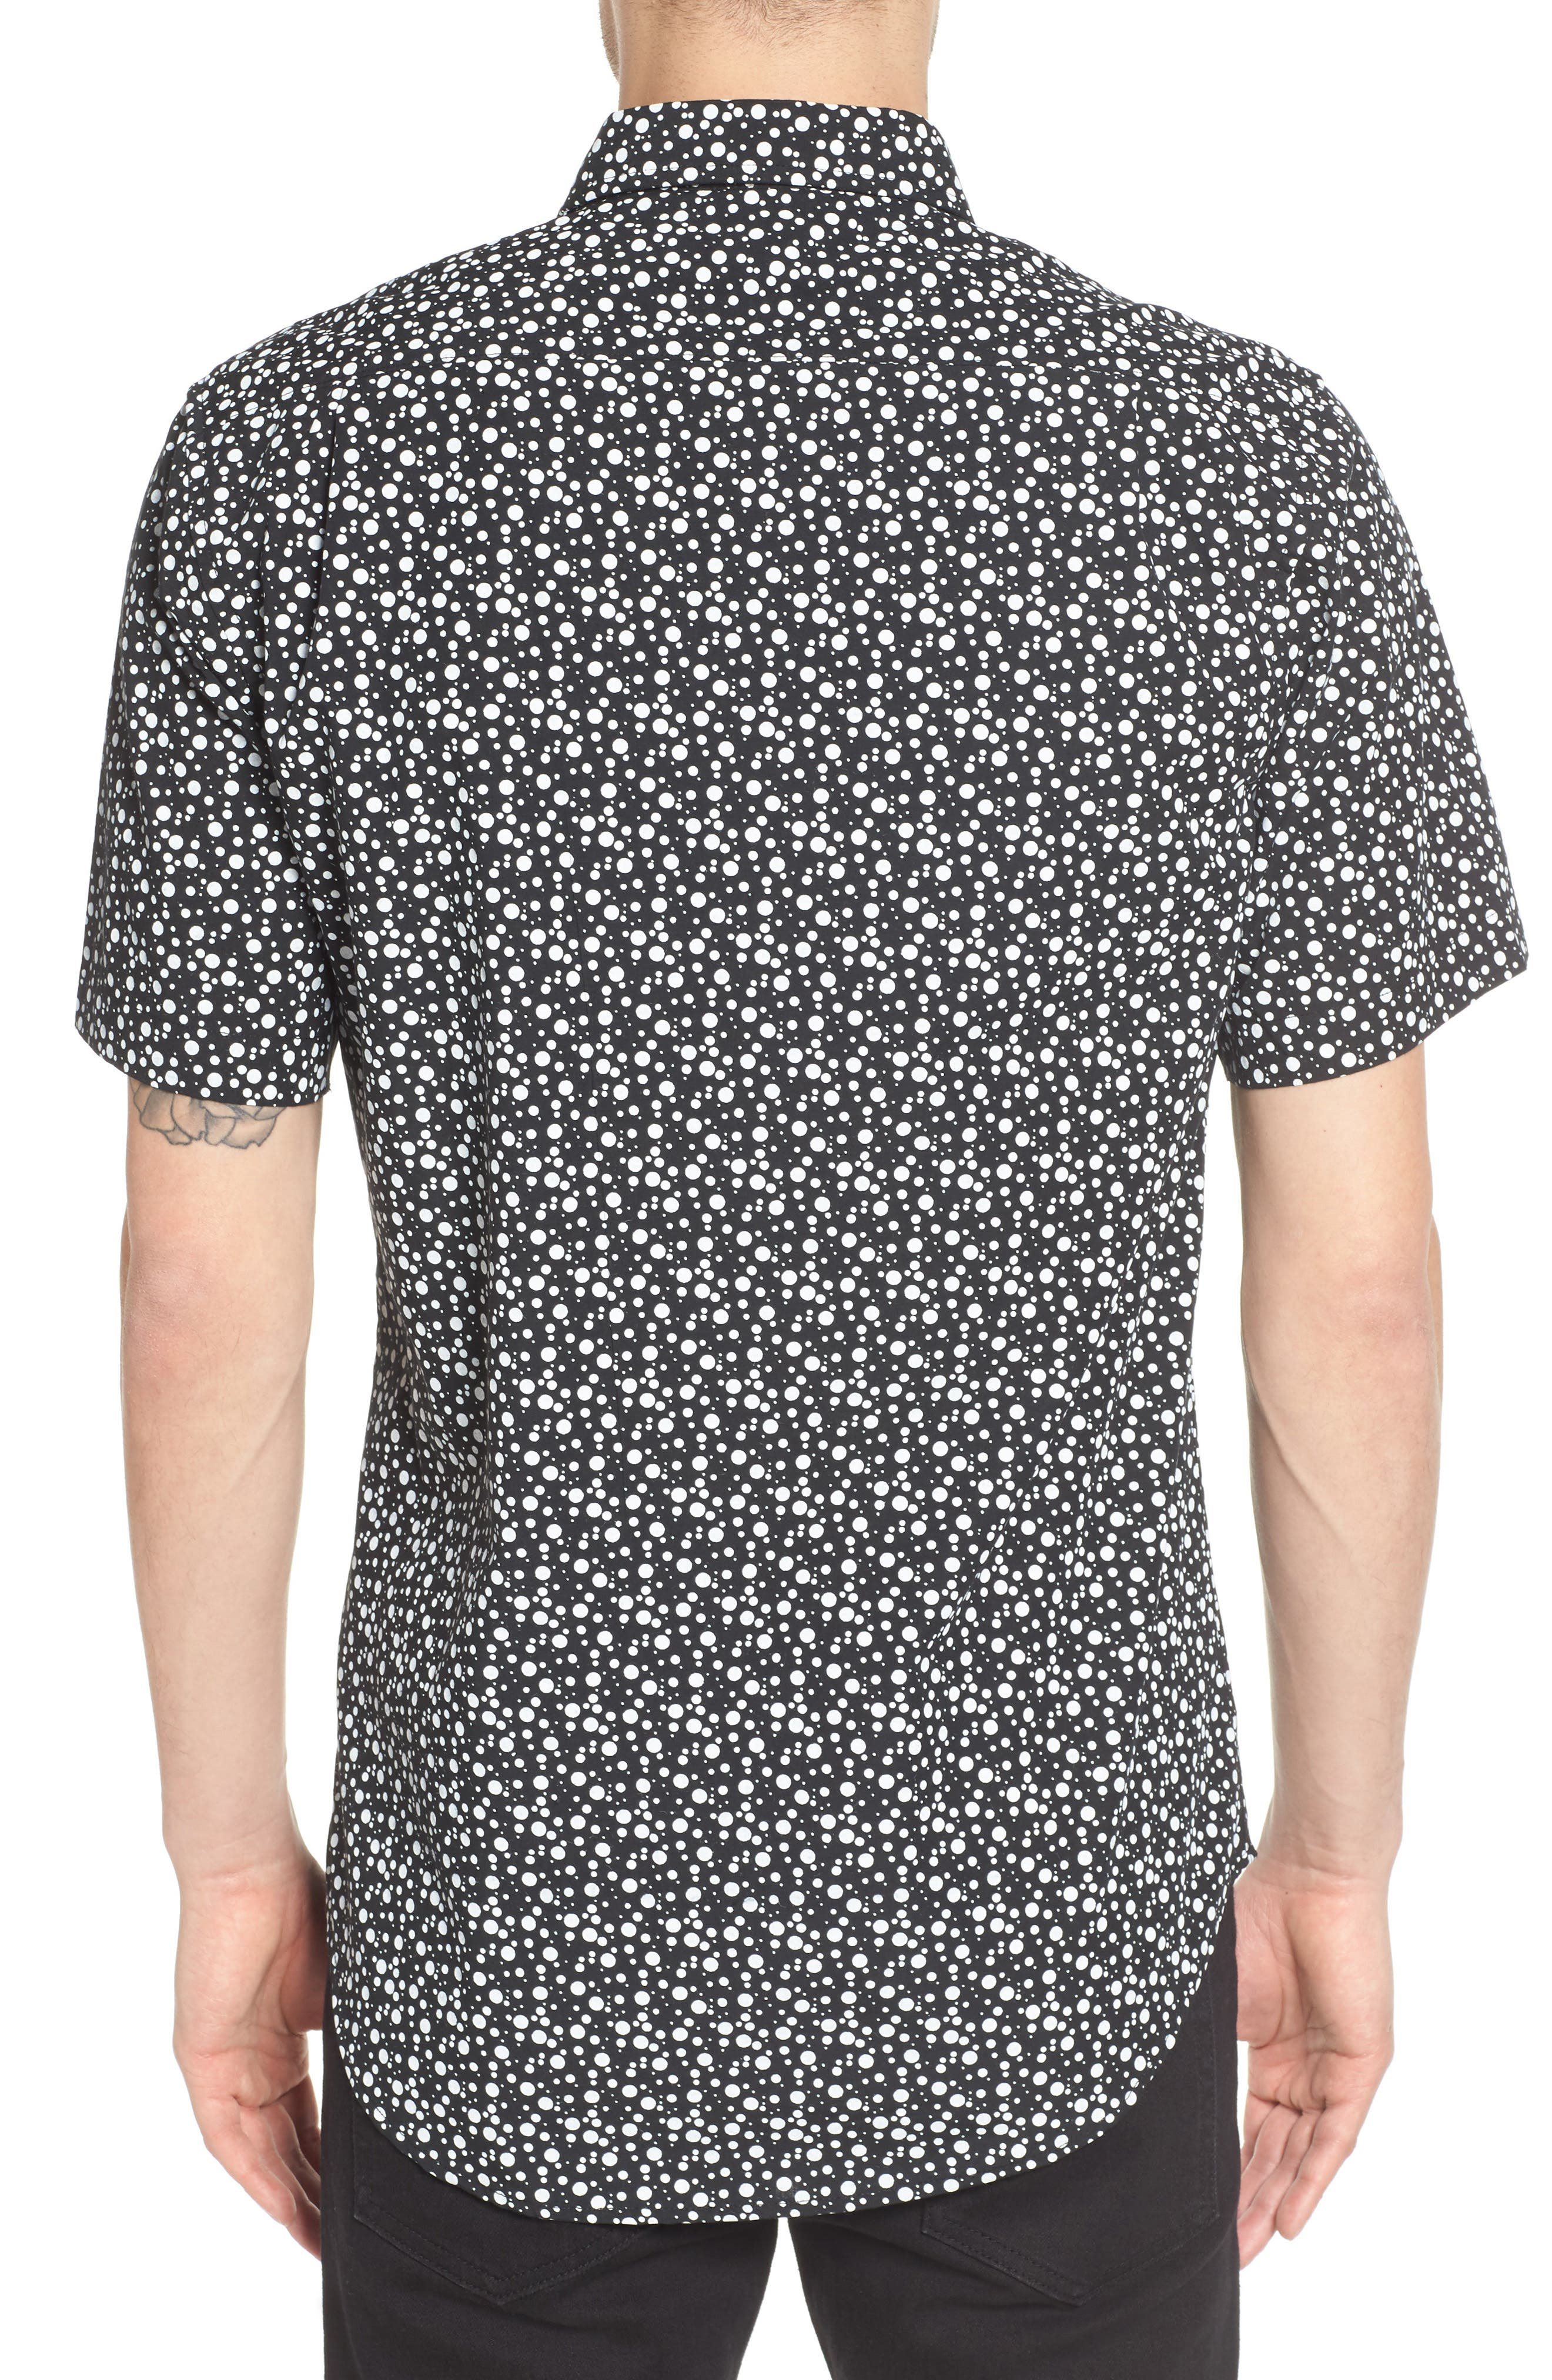 Alternate Image 2  - Ezekiel Bubble Print Woven Shirt